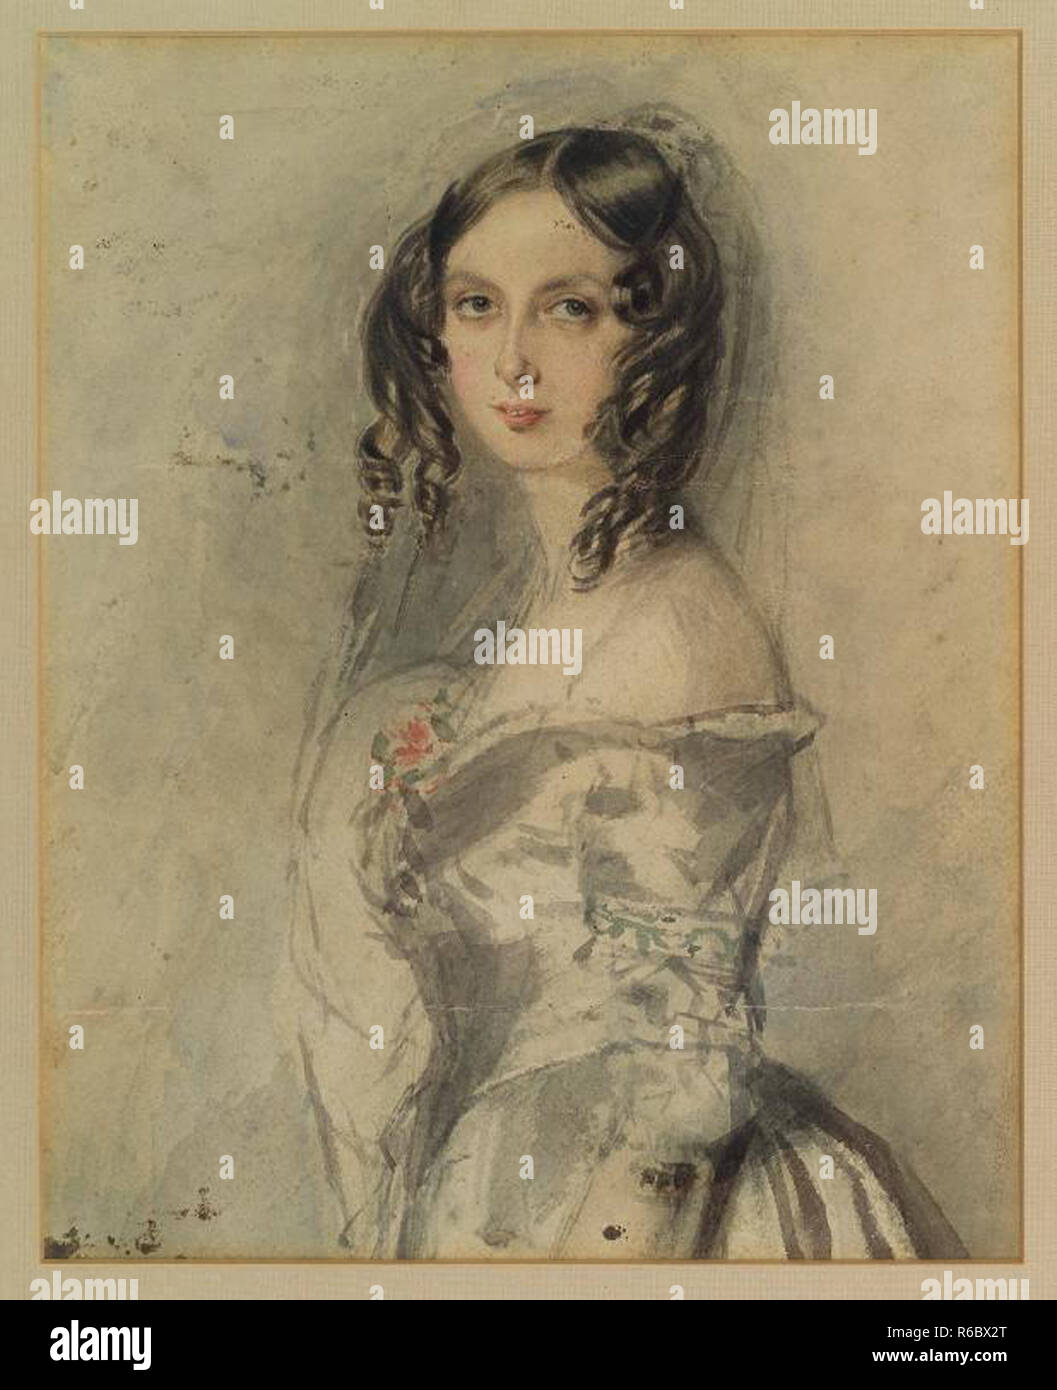 vintage lady victorian classic portrait artwork Stock Photo